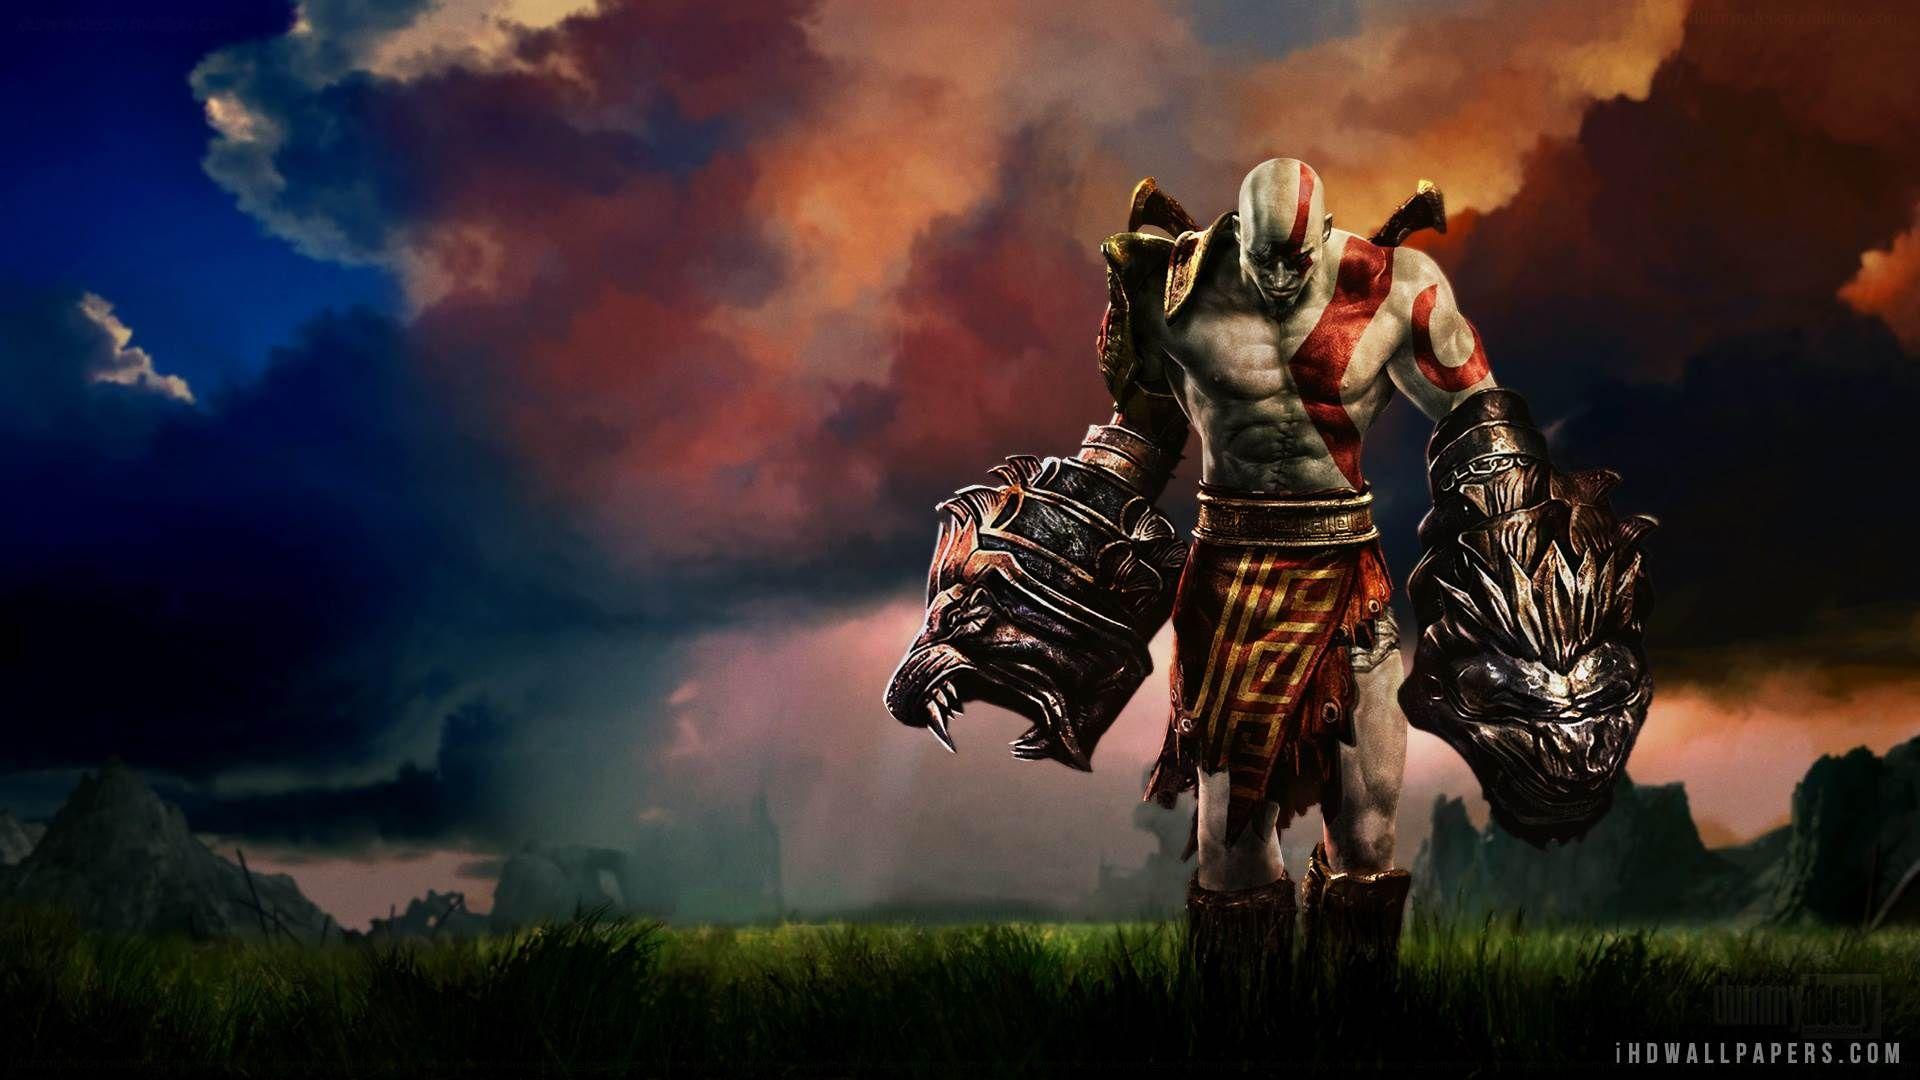 Kratos Wallpapers Hd Wallpaper 19201080 Kratos Hd